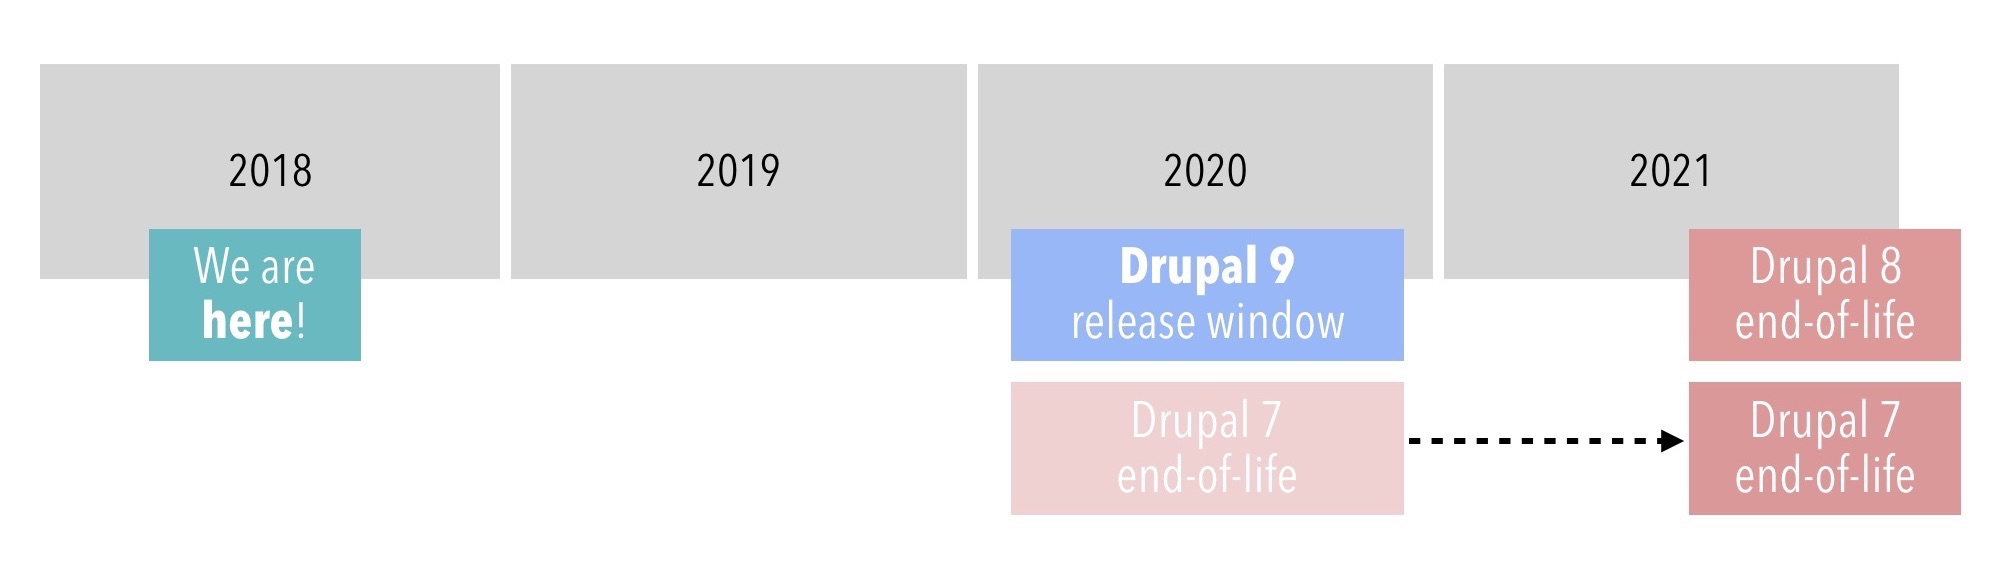 drupal 7.3